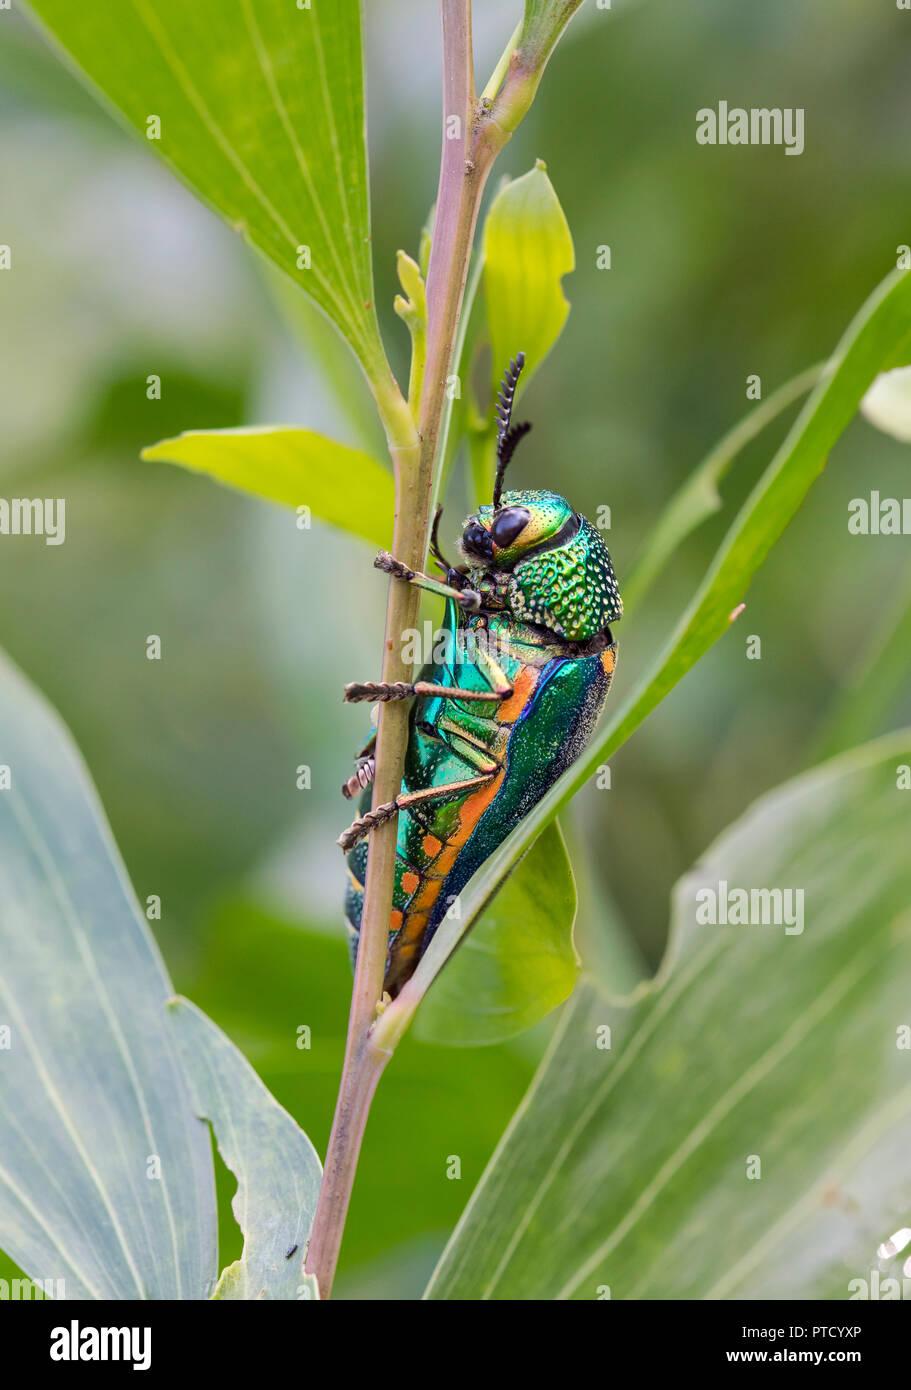 Jewel beetle (Buprestidae) in plant, Isaan, Thailand - Stock Image